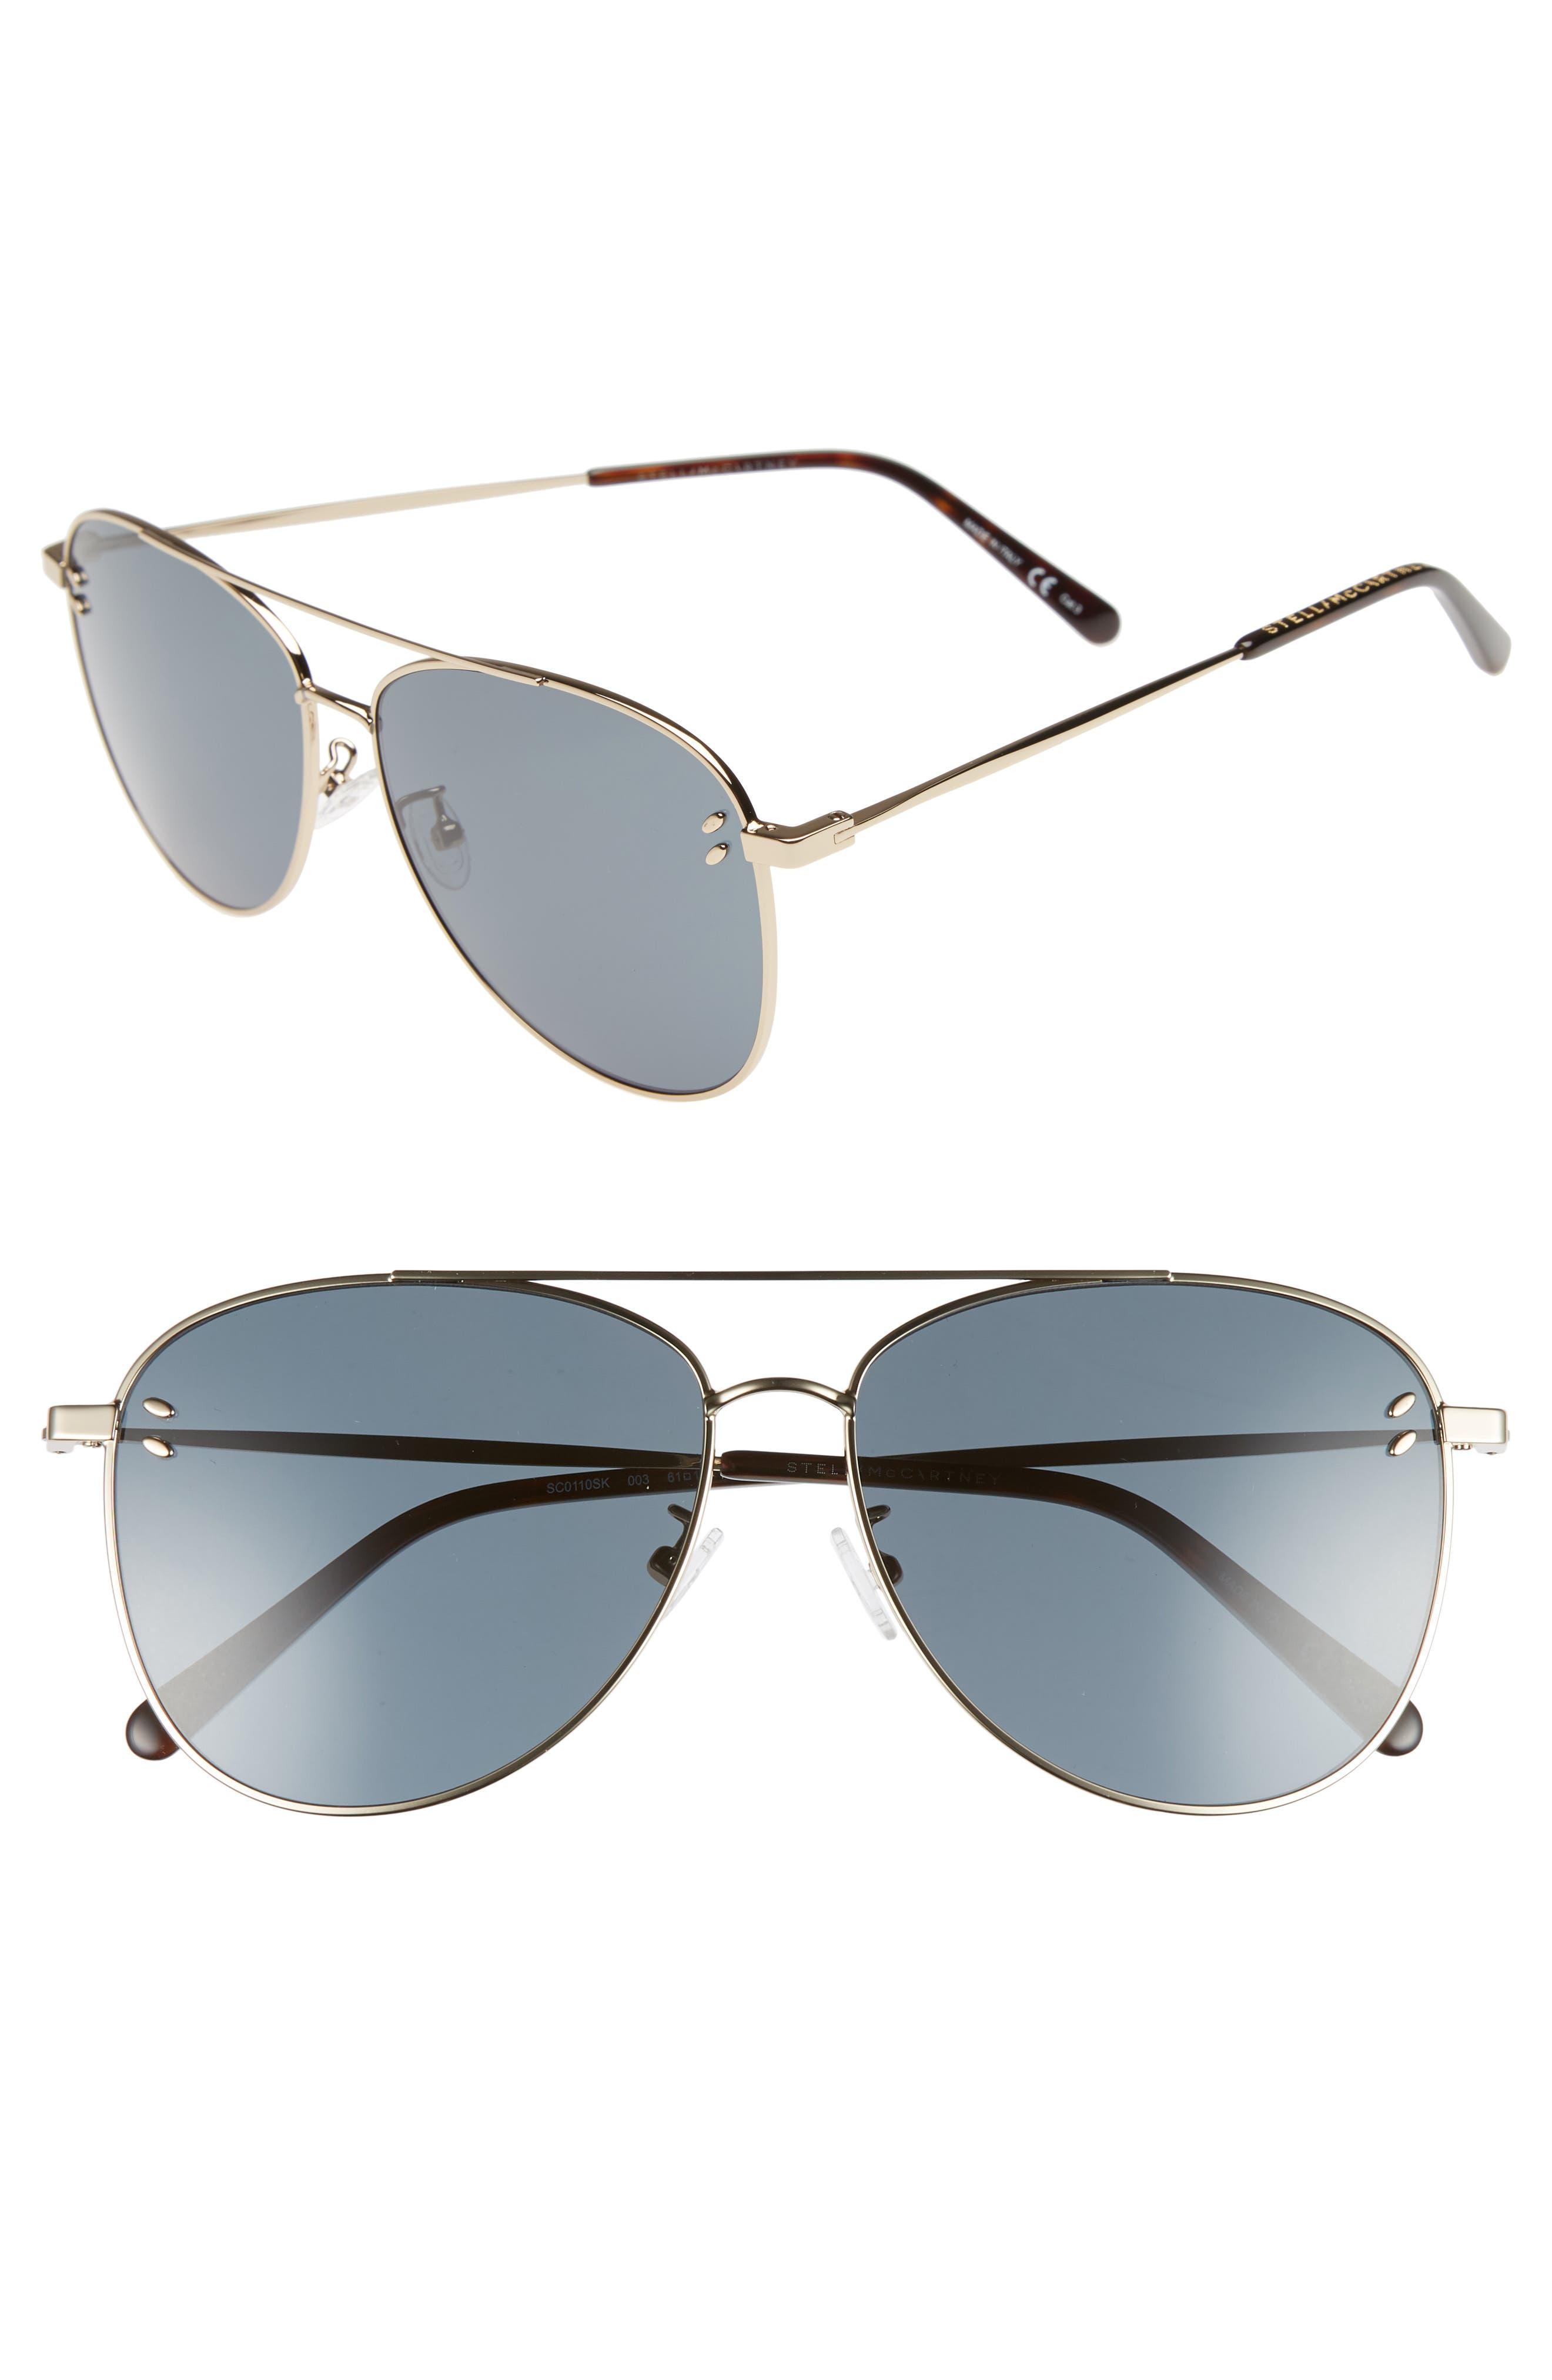 61mm Aviator Sunglasses,                             Main thumbnail 1, color,                             Gold